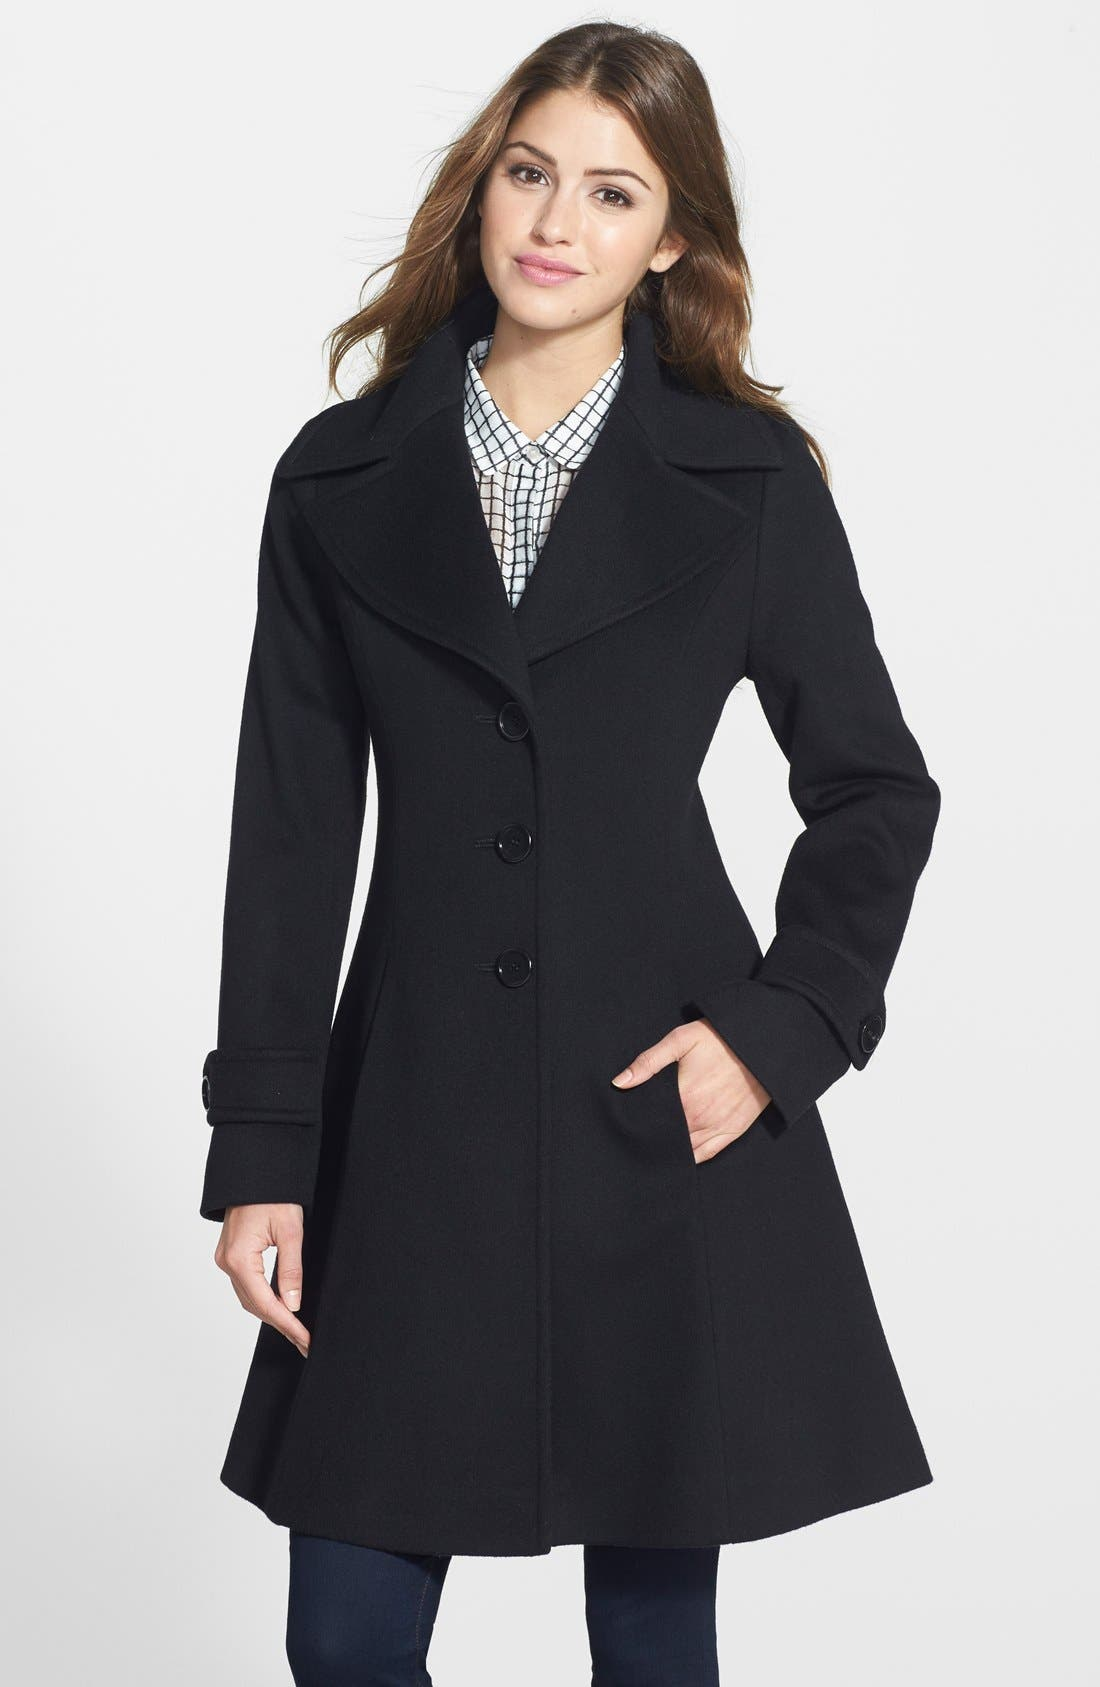 Main Image - Fleurette Loro Piana Wool Princess Coat (Petite) (Nordstrom Exclusive)